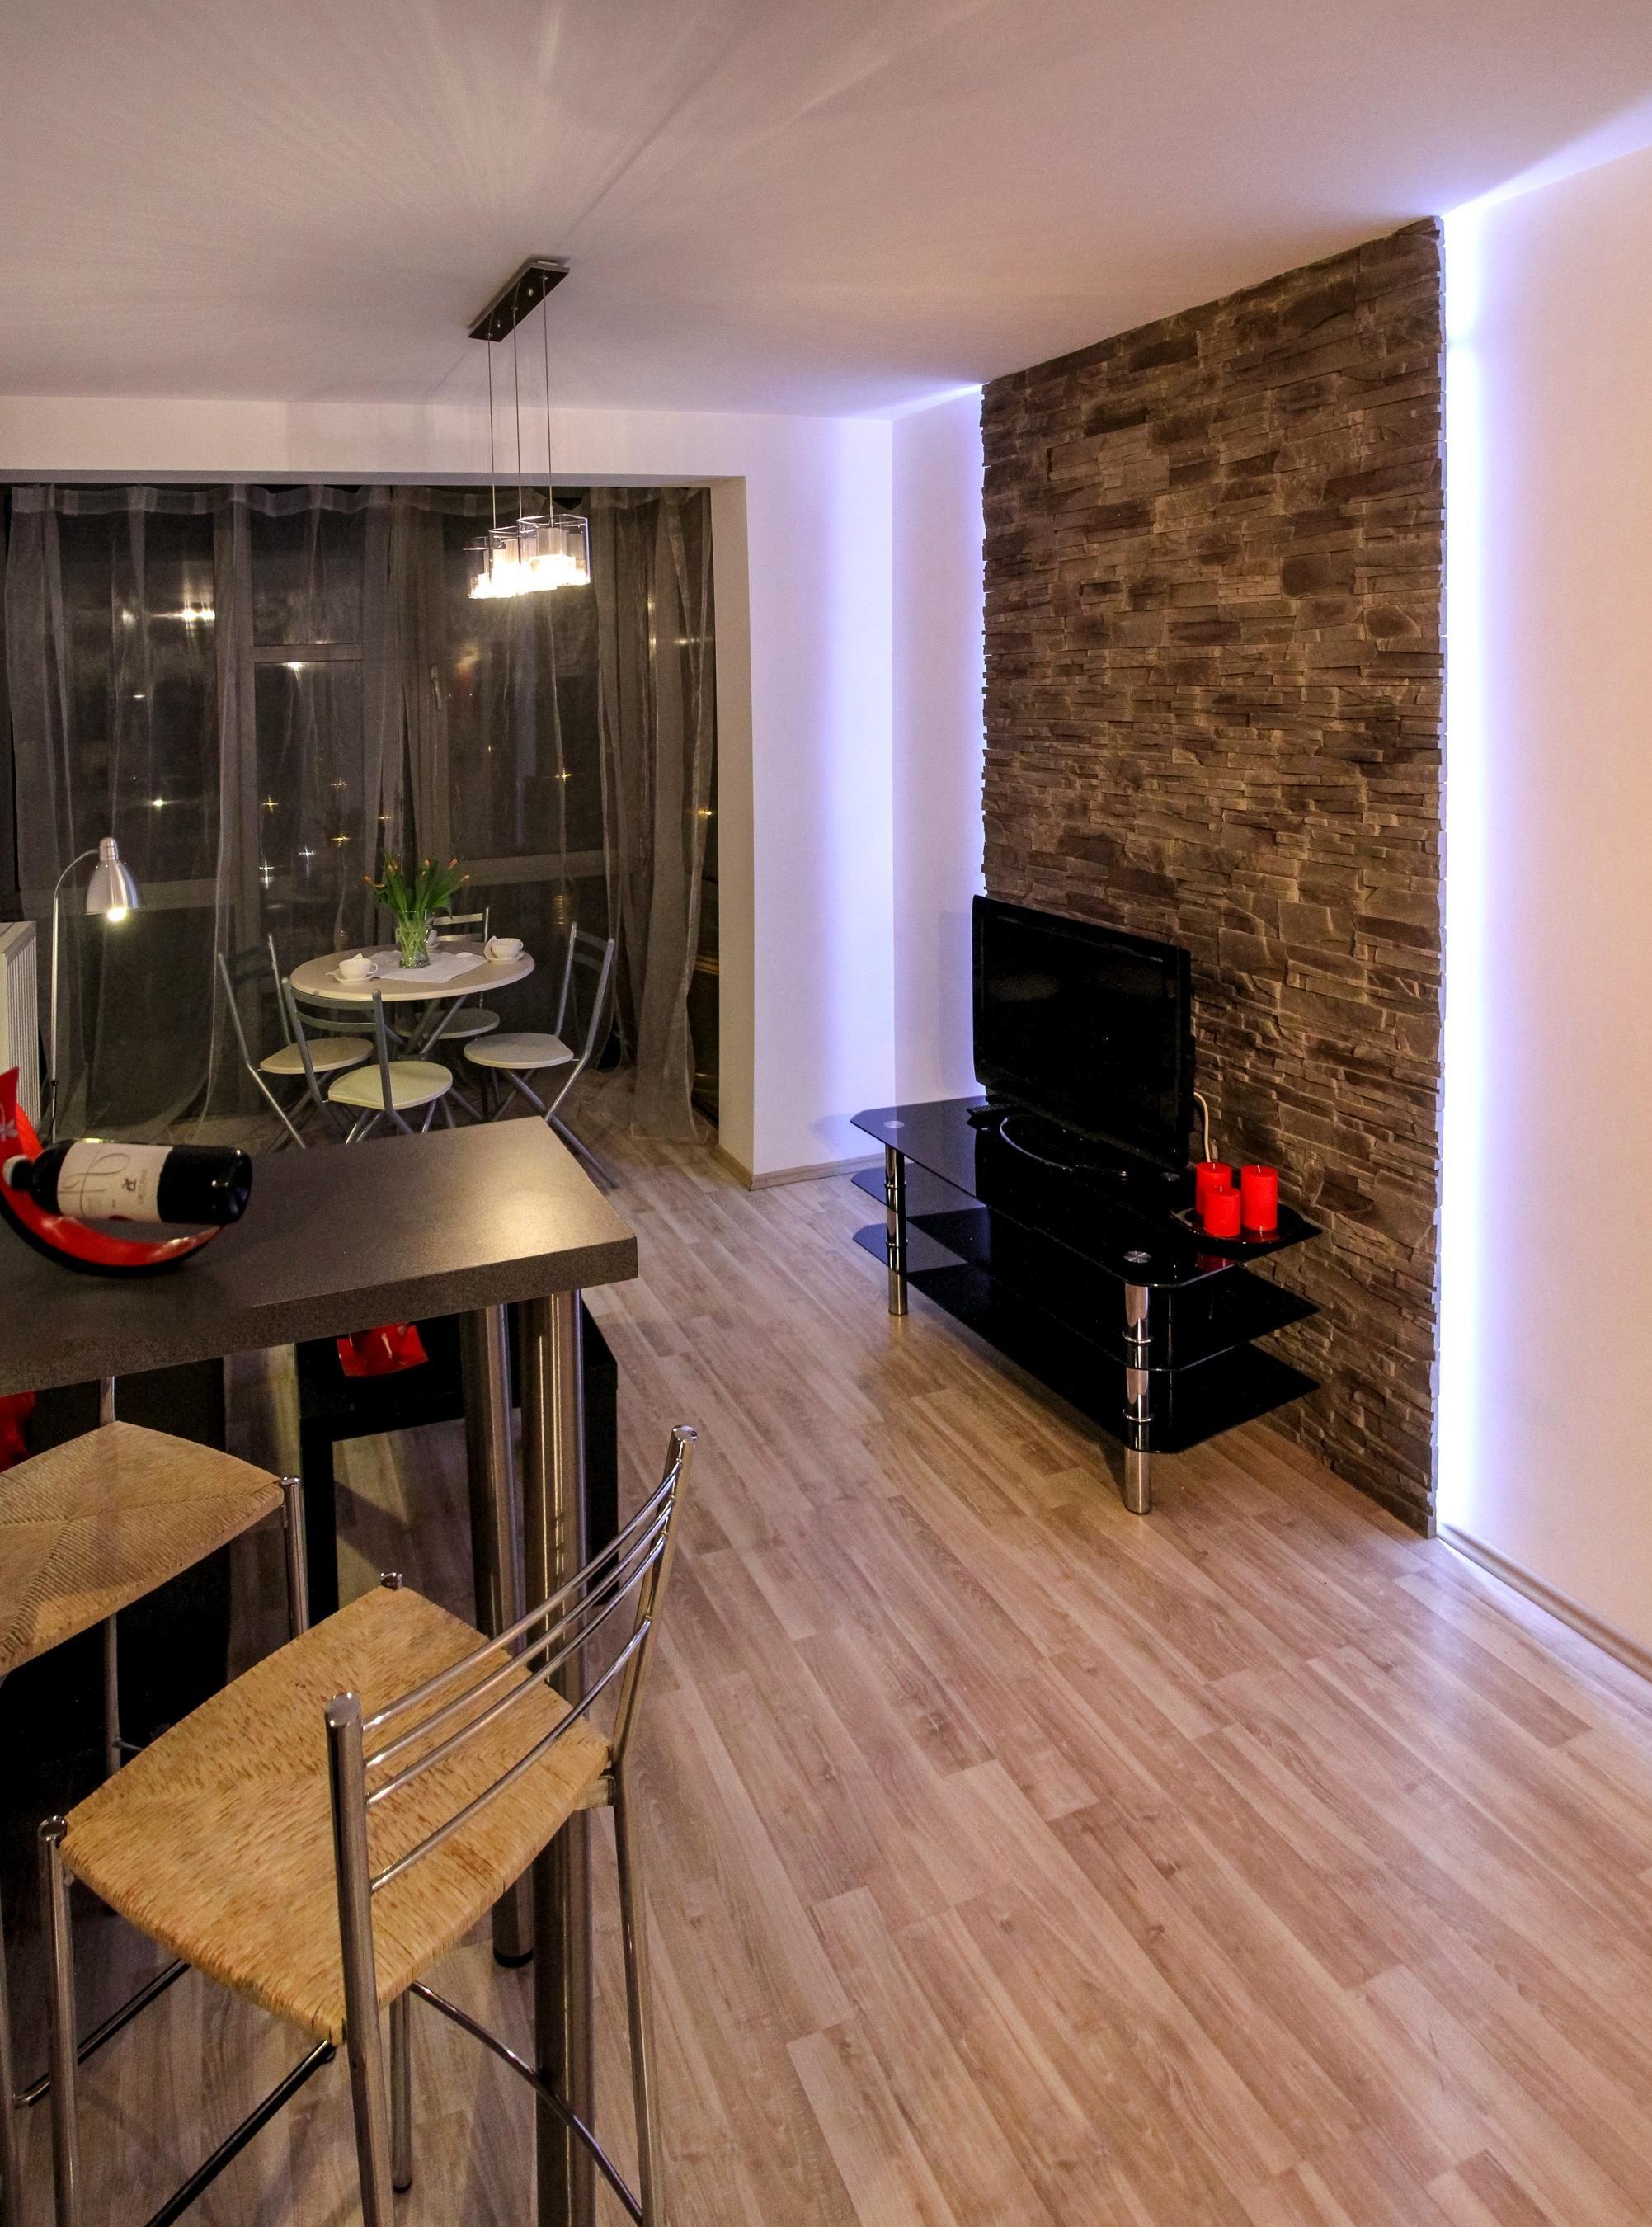 Room, Indoors, Furniture, Table, Inside, House, Floor, Interior